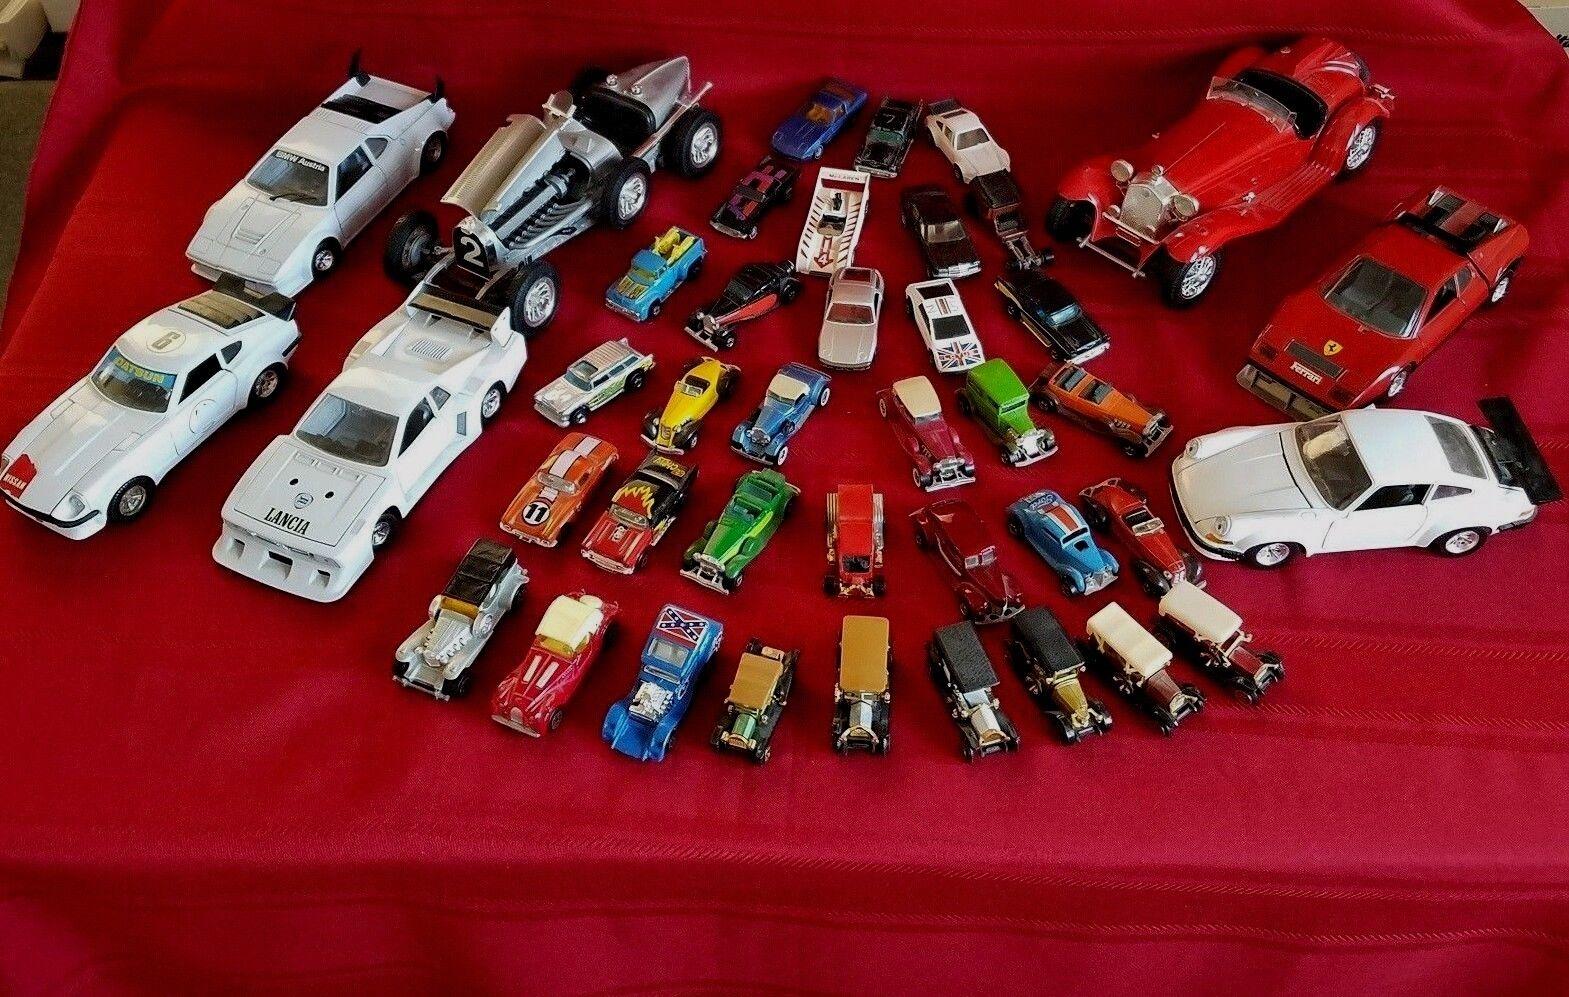 Vintage Toy Car Collection (Durago, Siku, Hot Wheels, + more) [41 cars]